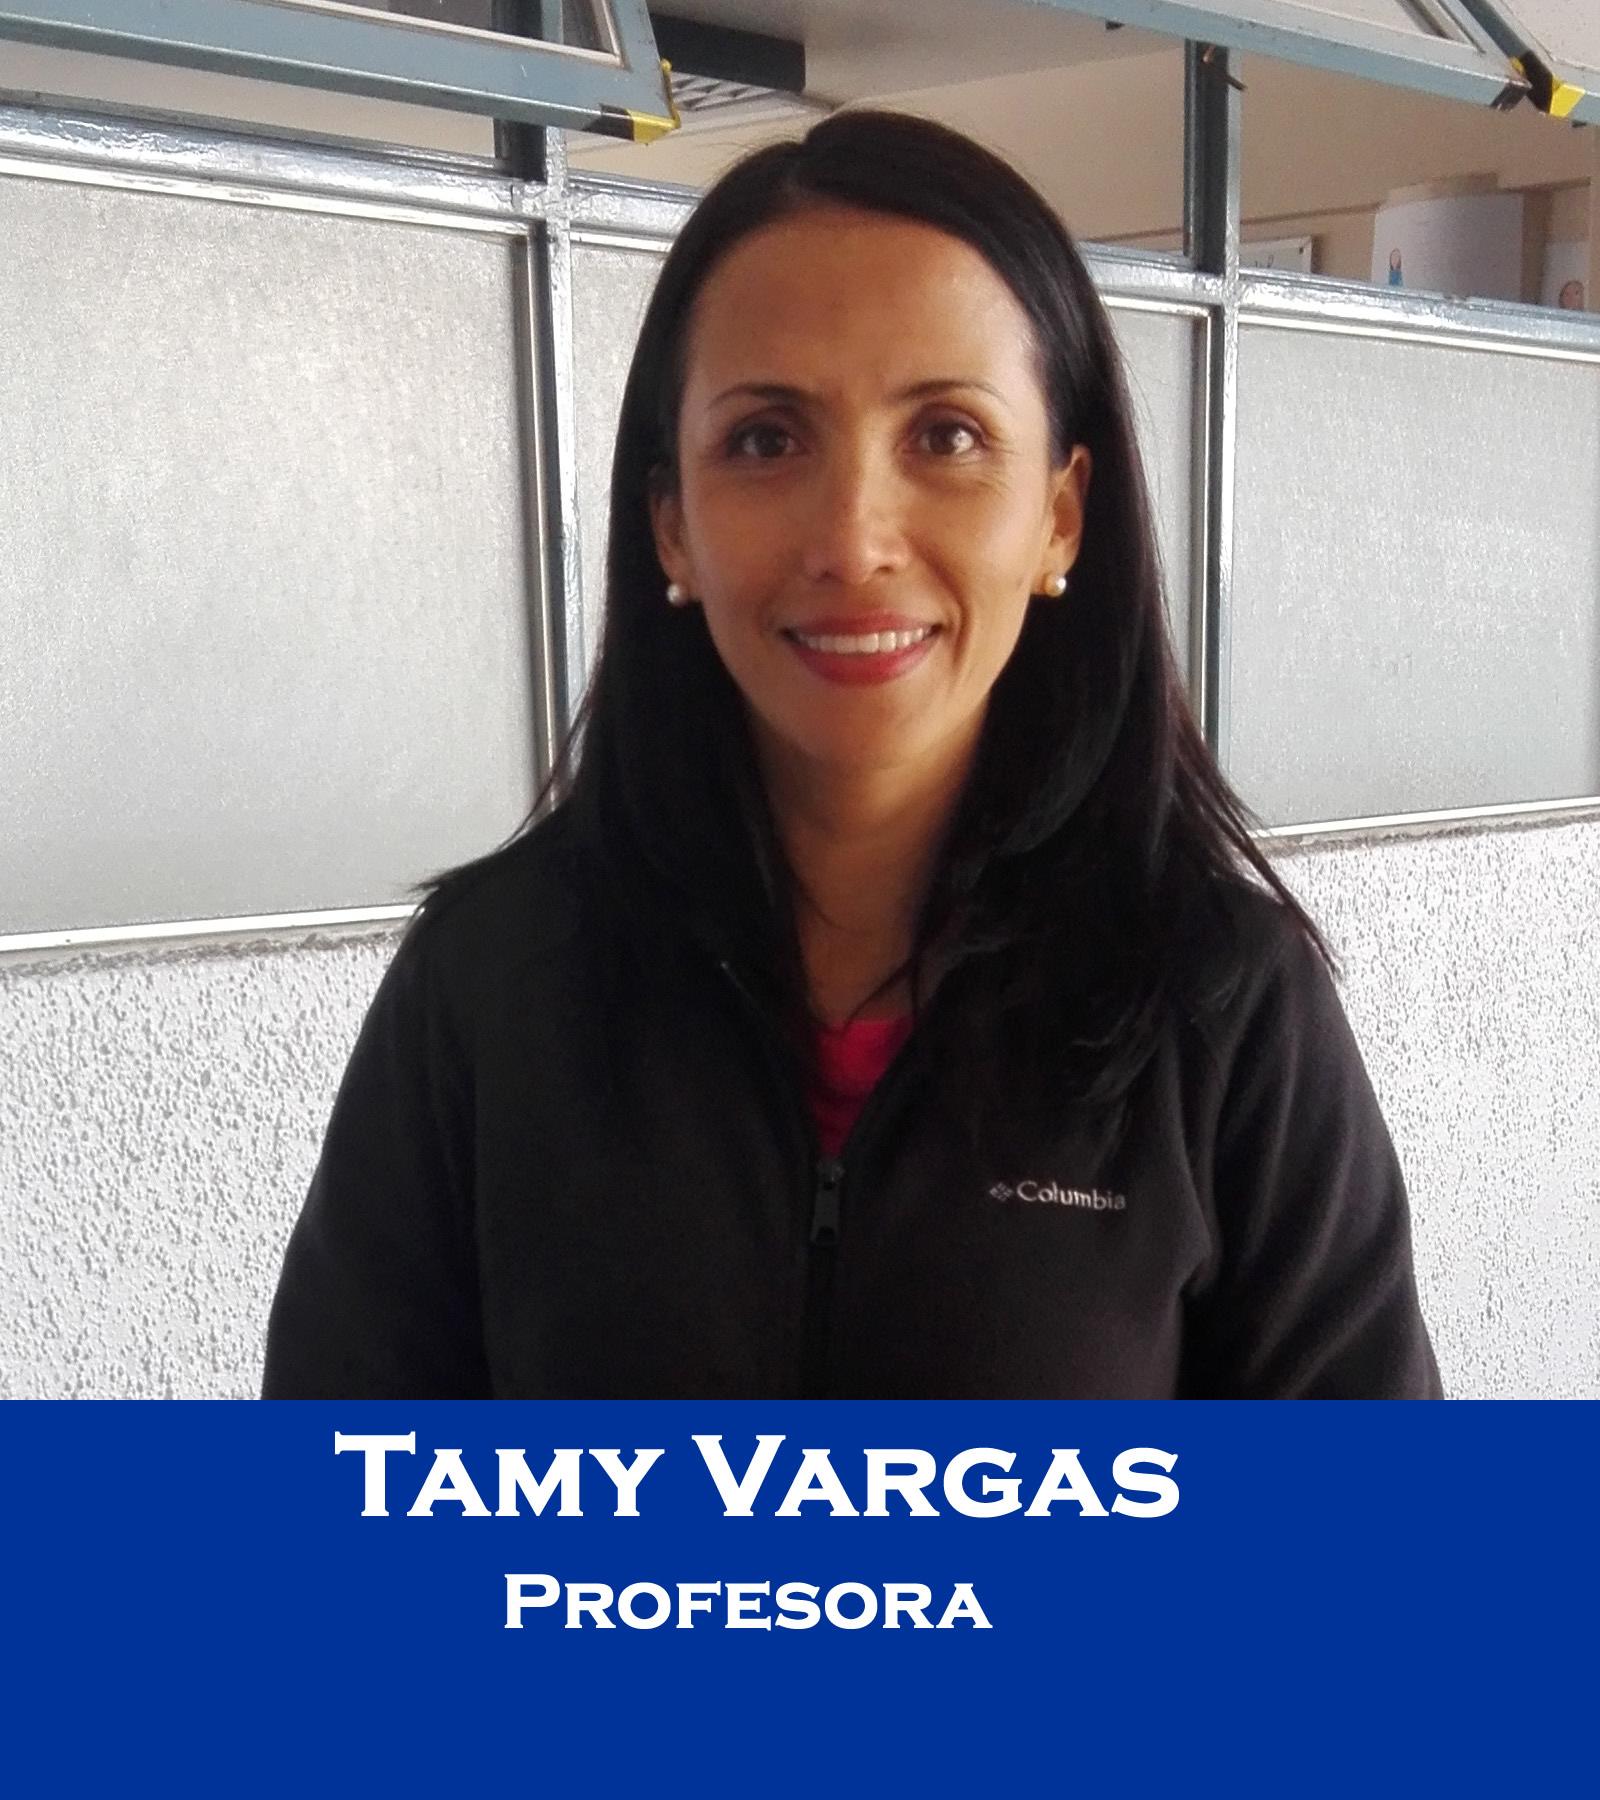 Tamy-Vargas